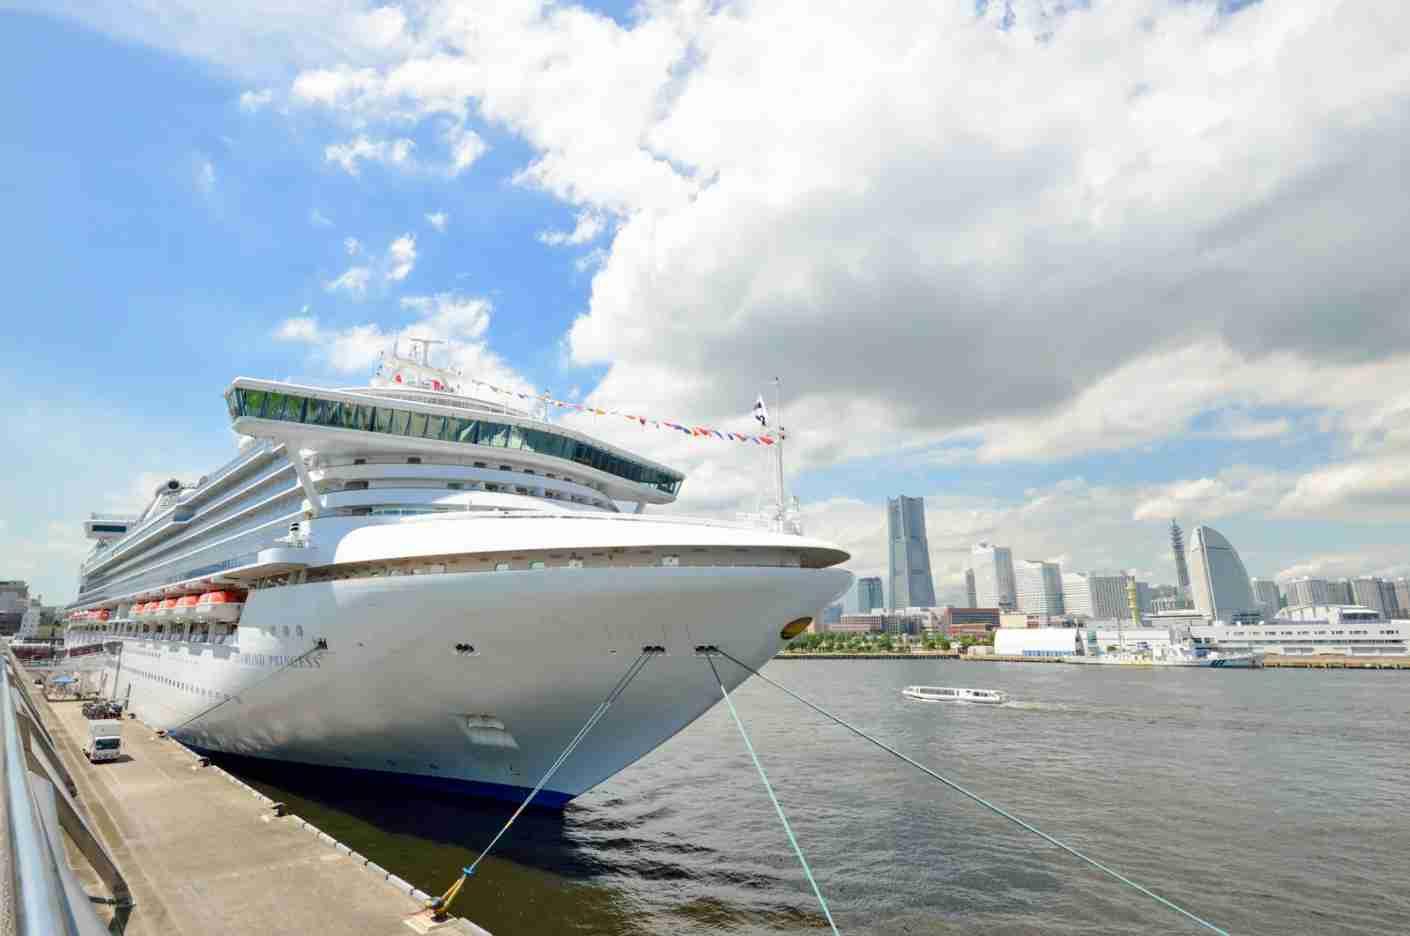 The Diamond Princess, a Princess Cruise line ship, docked in Yokohama, Japan. (Photo via Shutterstock)